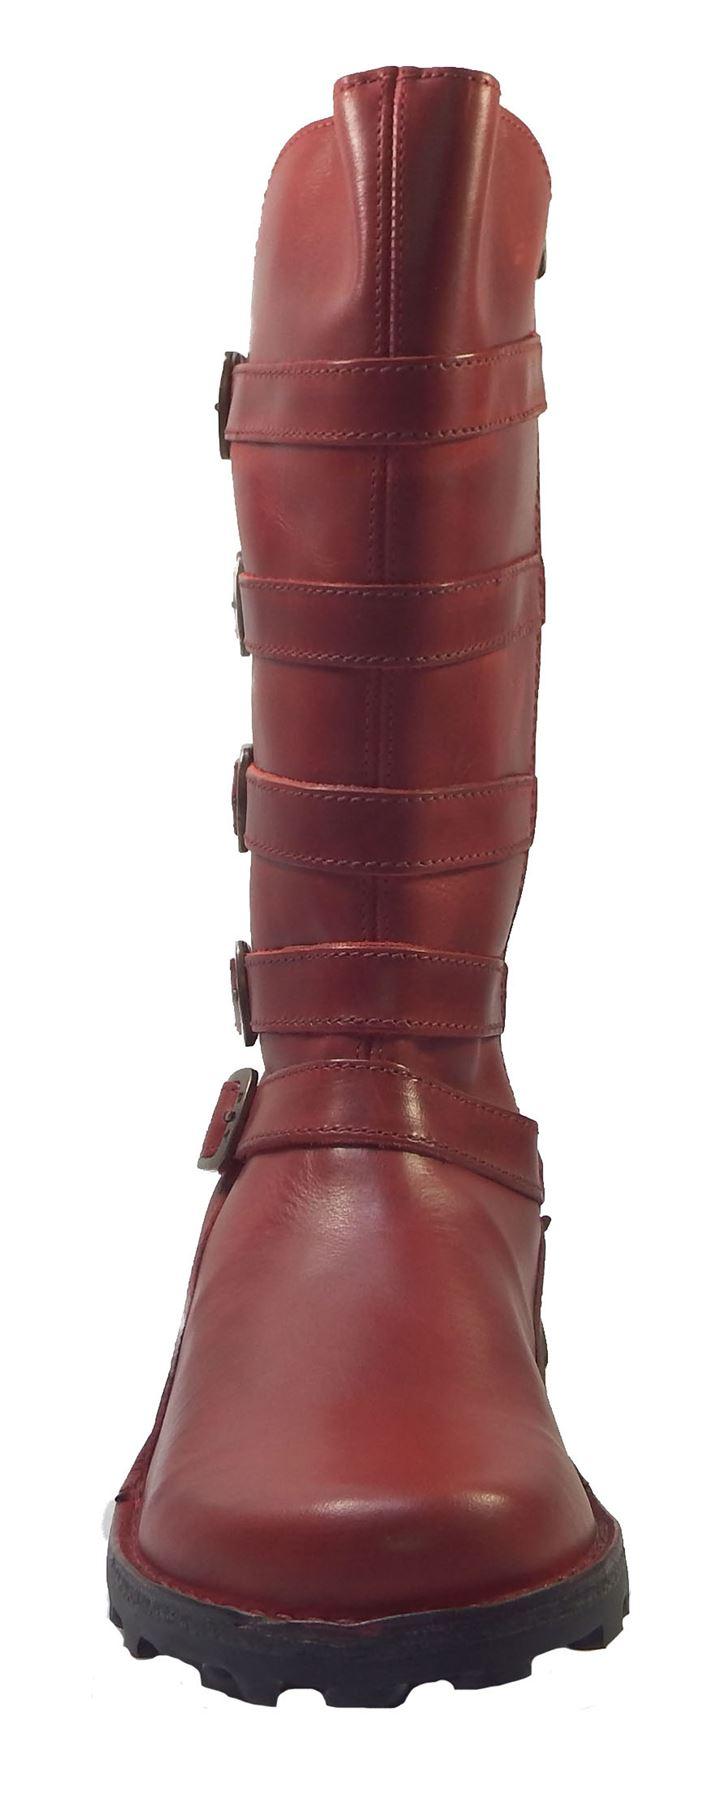 Fly London Meca Rug Leder 5x Strap Mid Mid Mid Calf Biker Style Stiefel Meca896Fly 1f5aa2